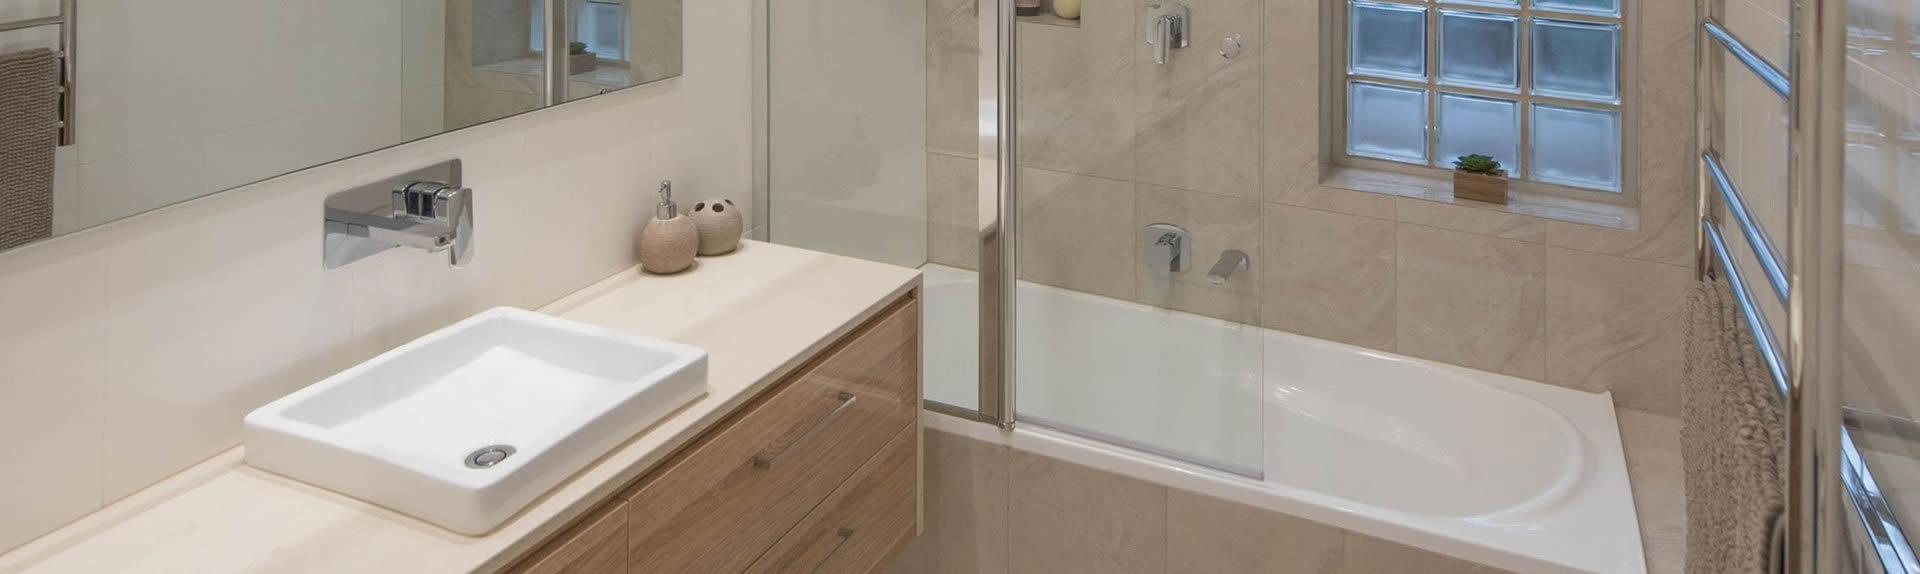 Modern bathroom renovation in Adelaide